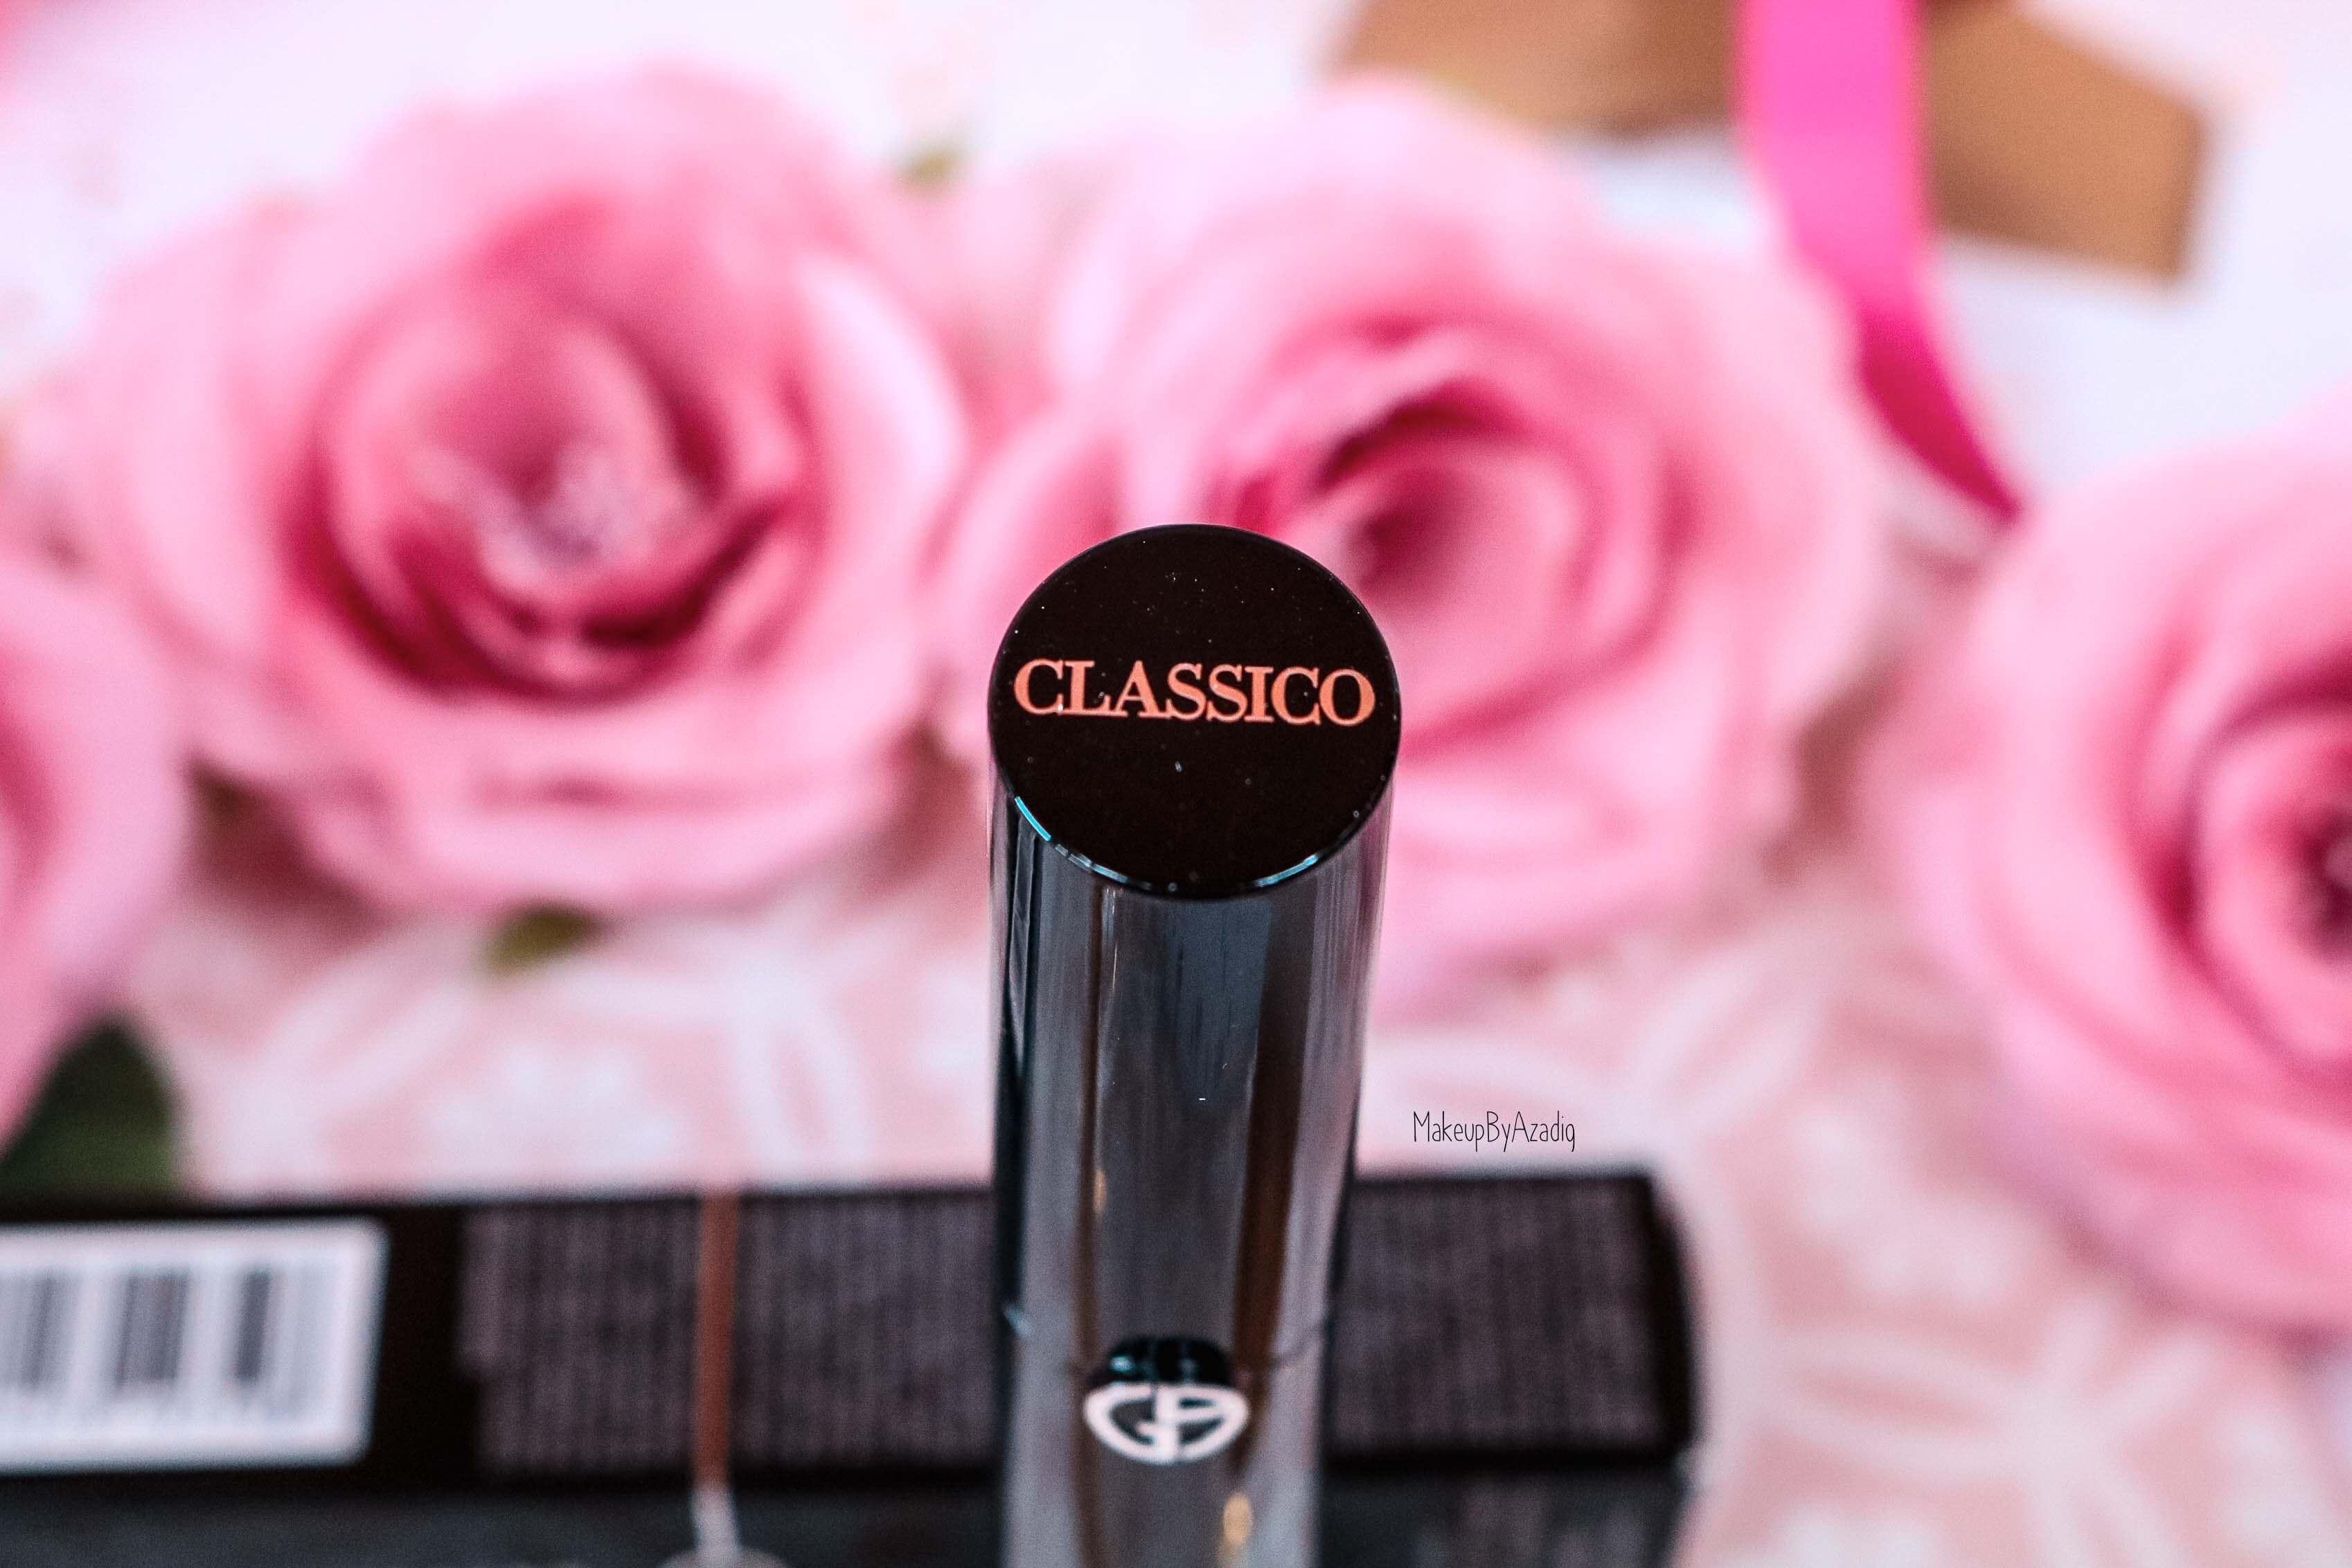 revue-meilleur-mascara-noir-giorgio-armani-eyes-to-kill-classico-volume-longueur-avis-prix-sephora-makeupbyazadig-best